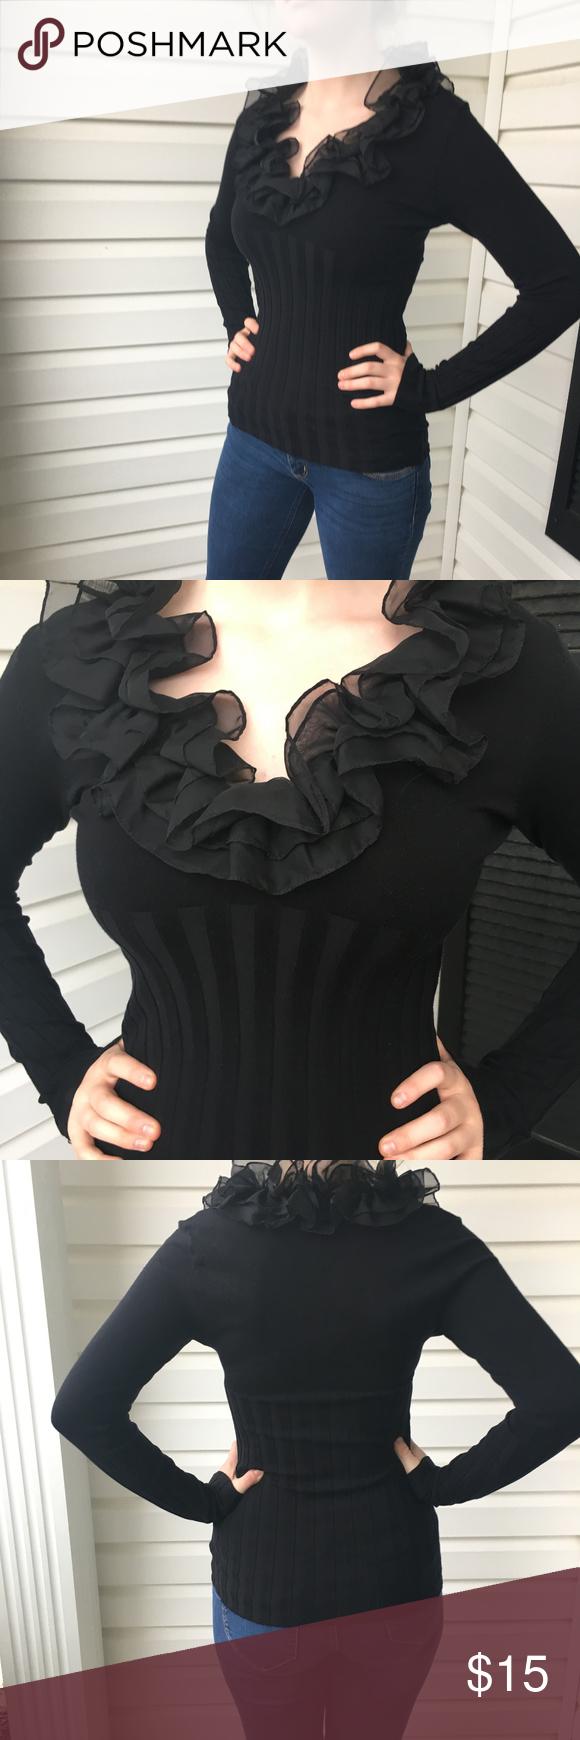 Cache womenus shirt black ruffled vneck small pinterest